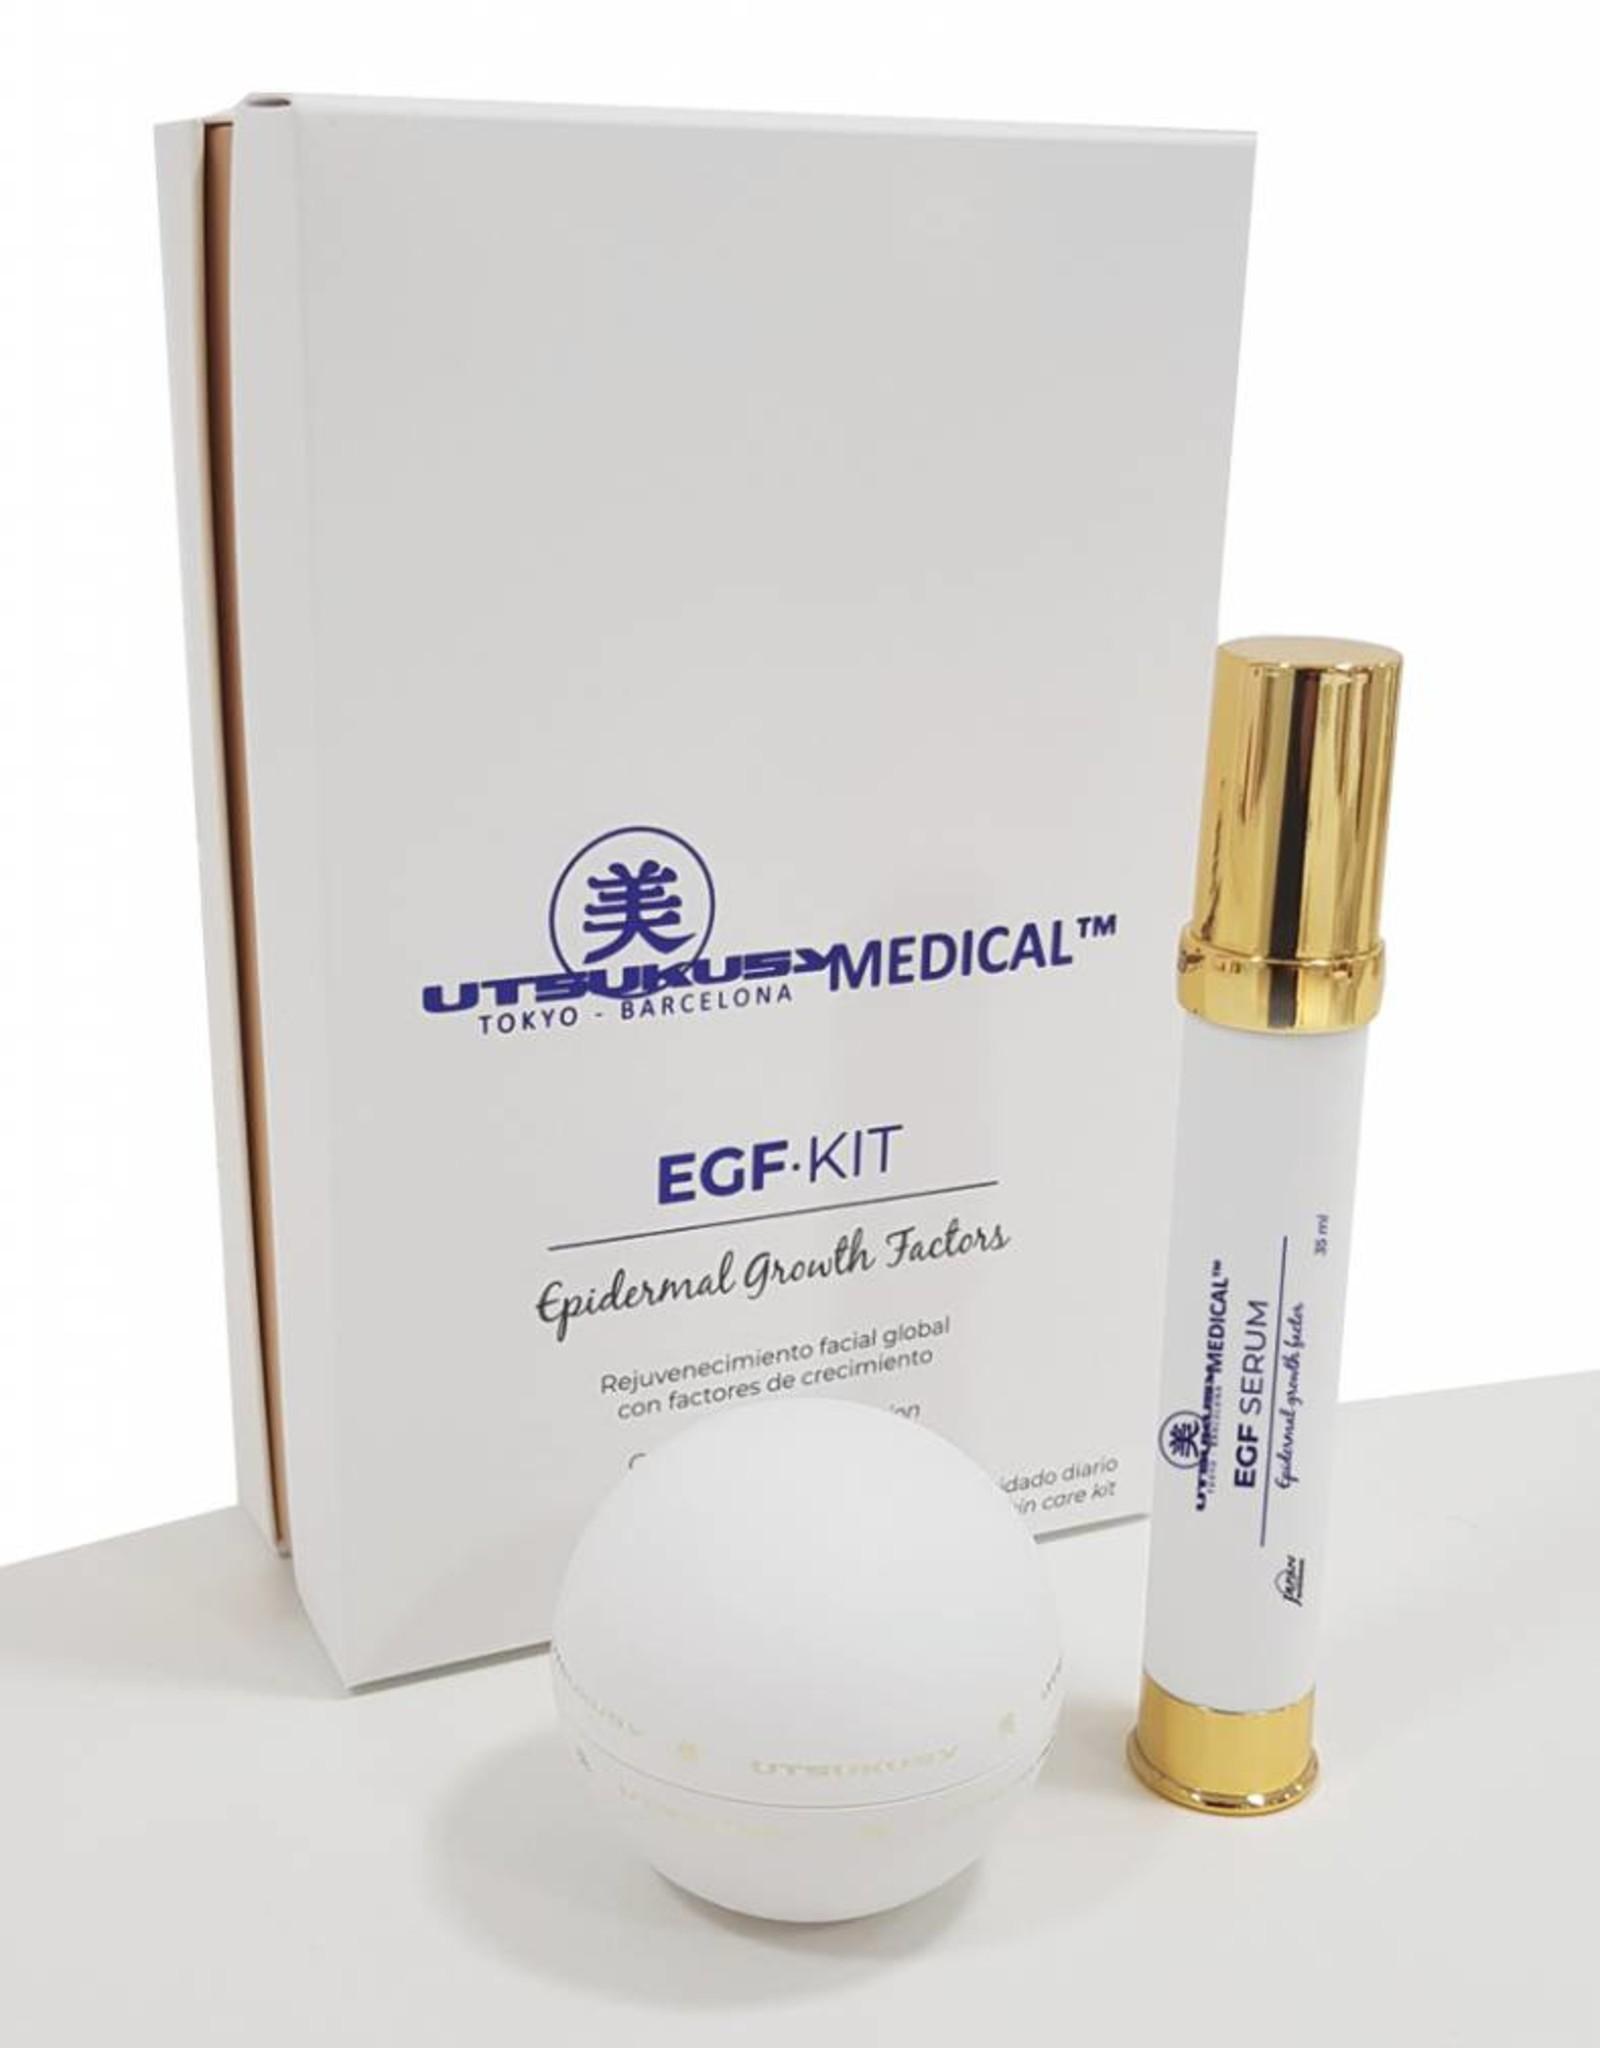 Utsukusy Plasma Skin EGF home care kit